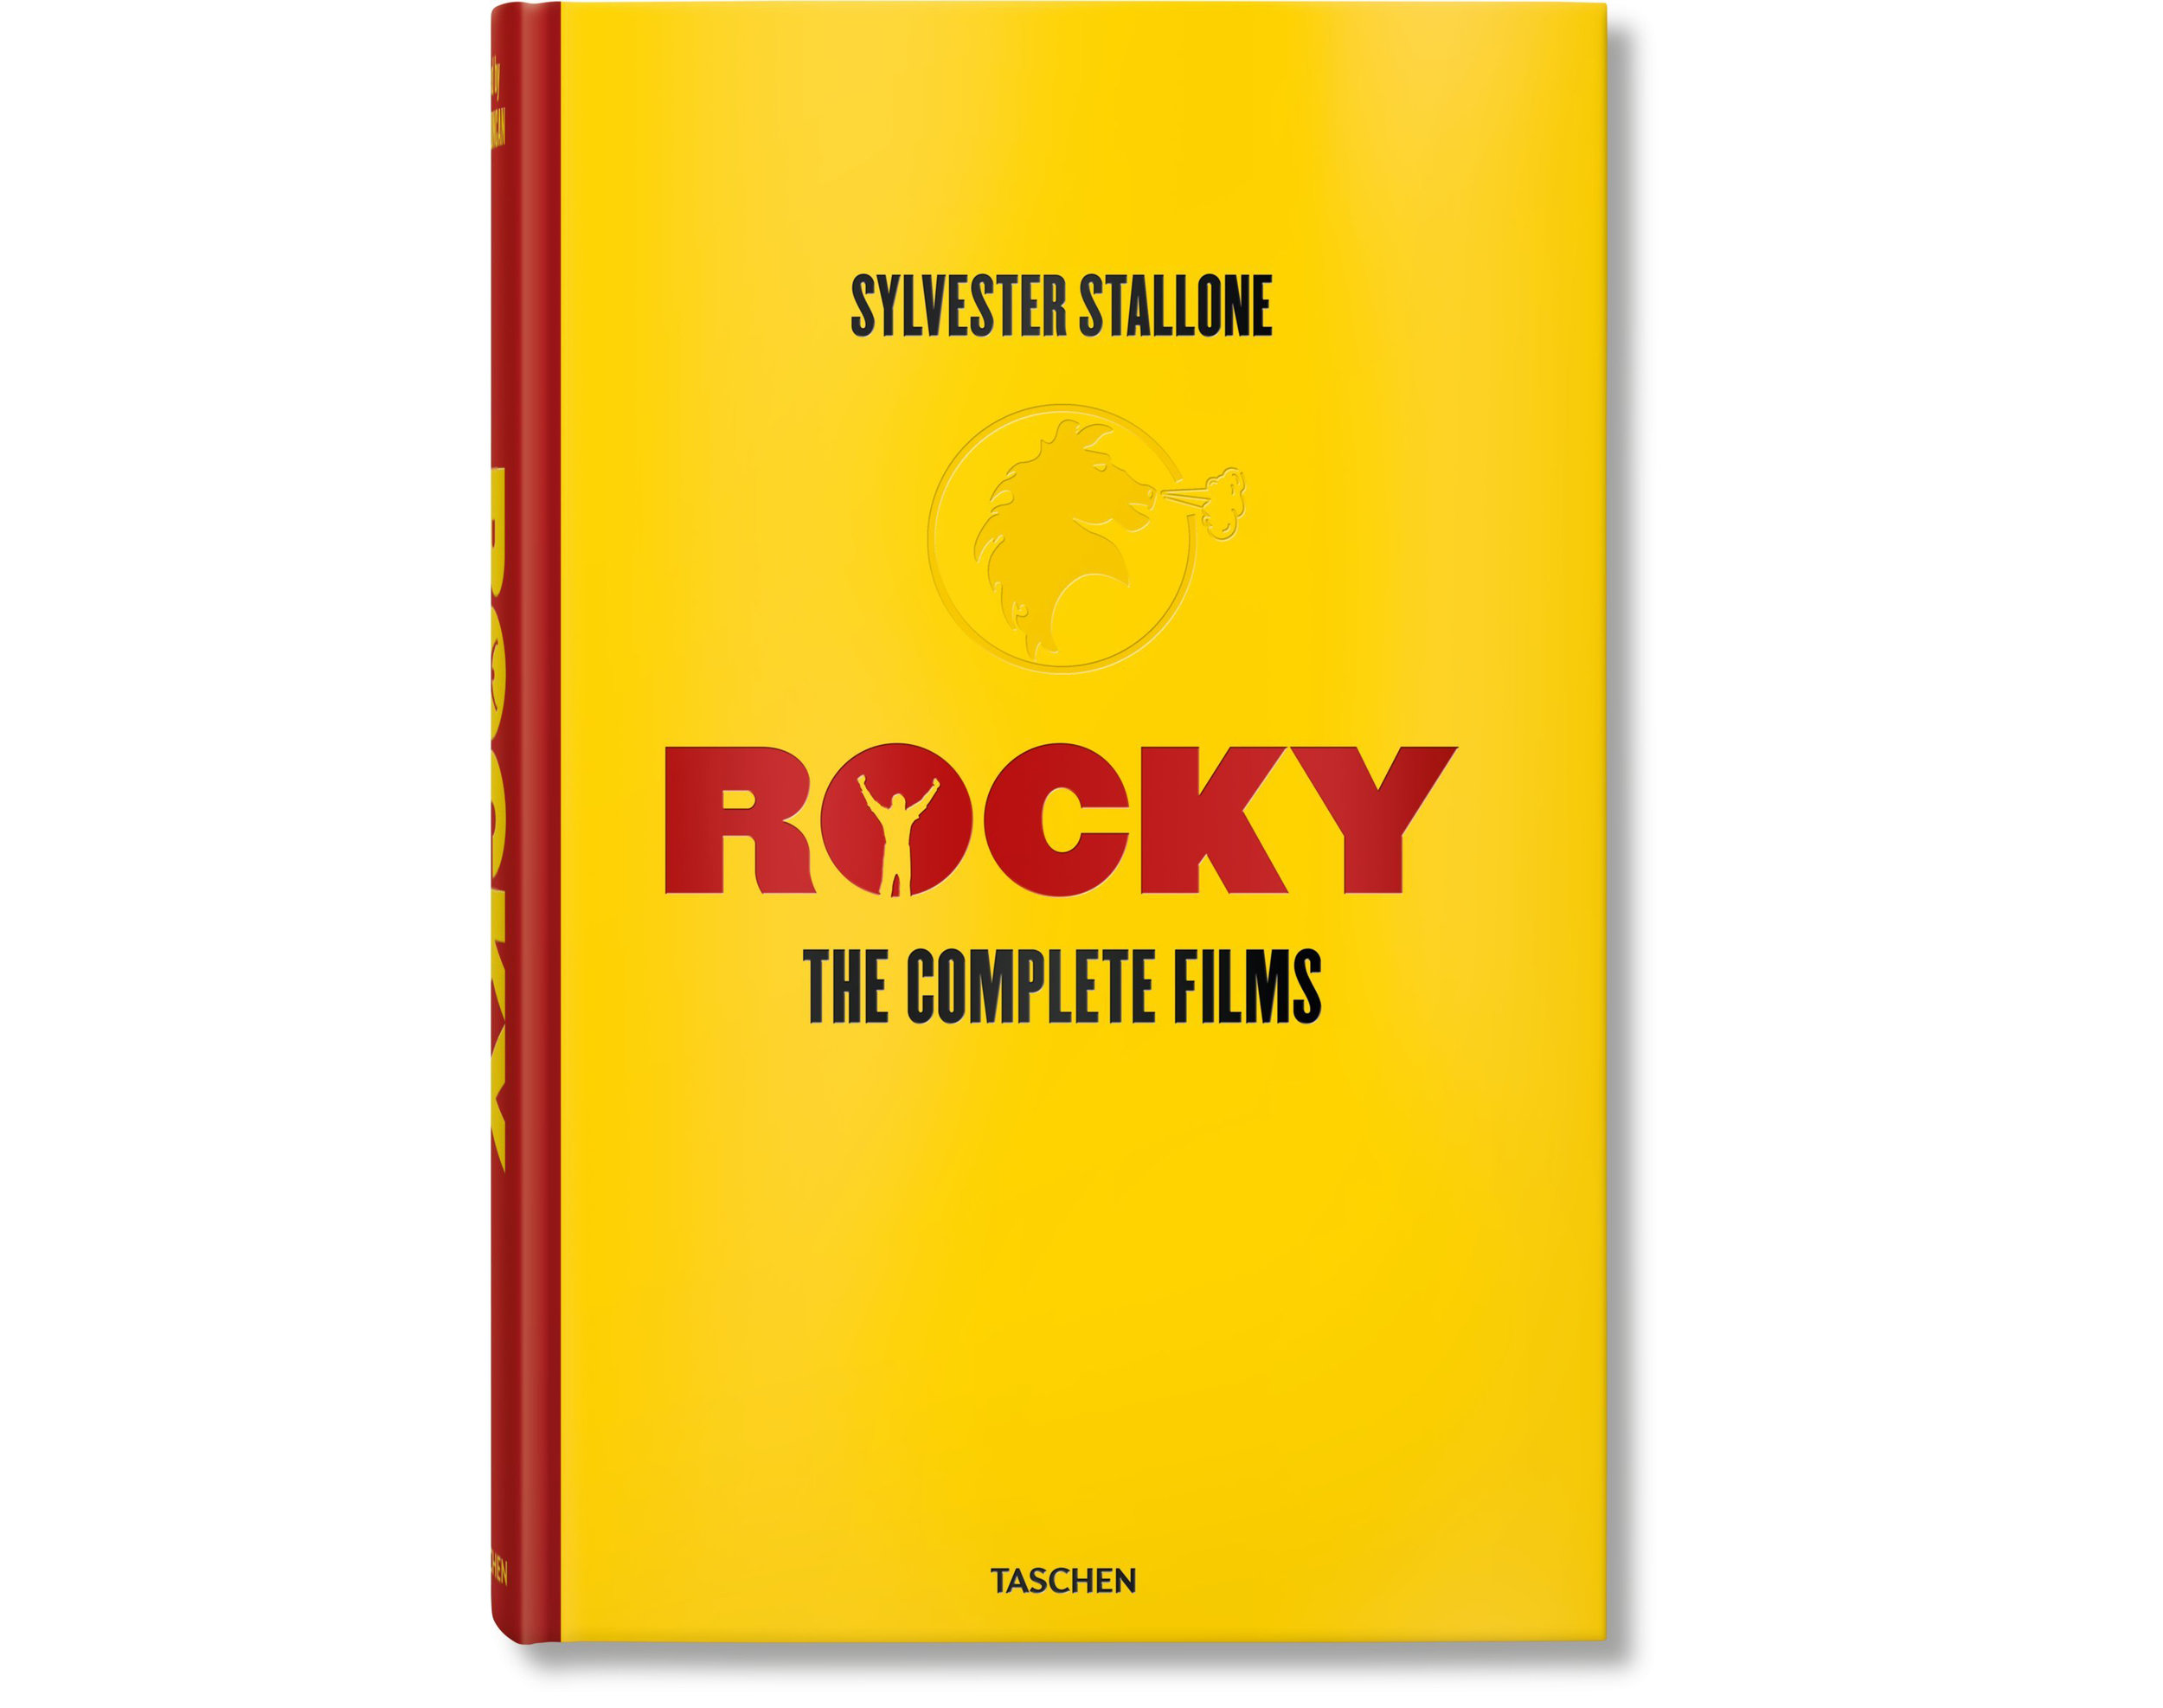 ce-rocky-cover_03144.jpg